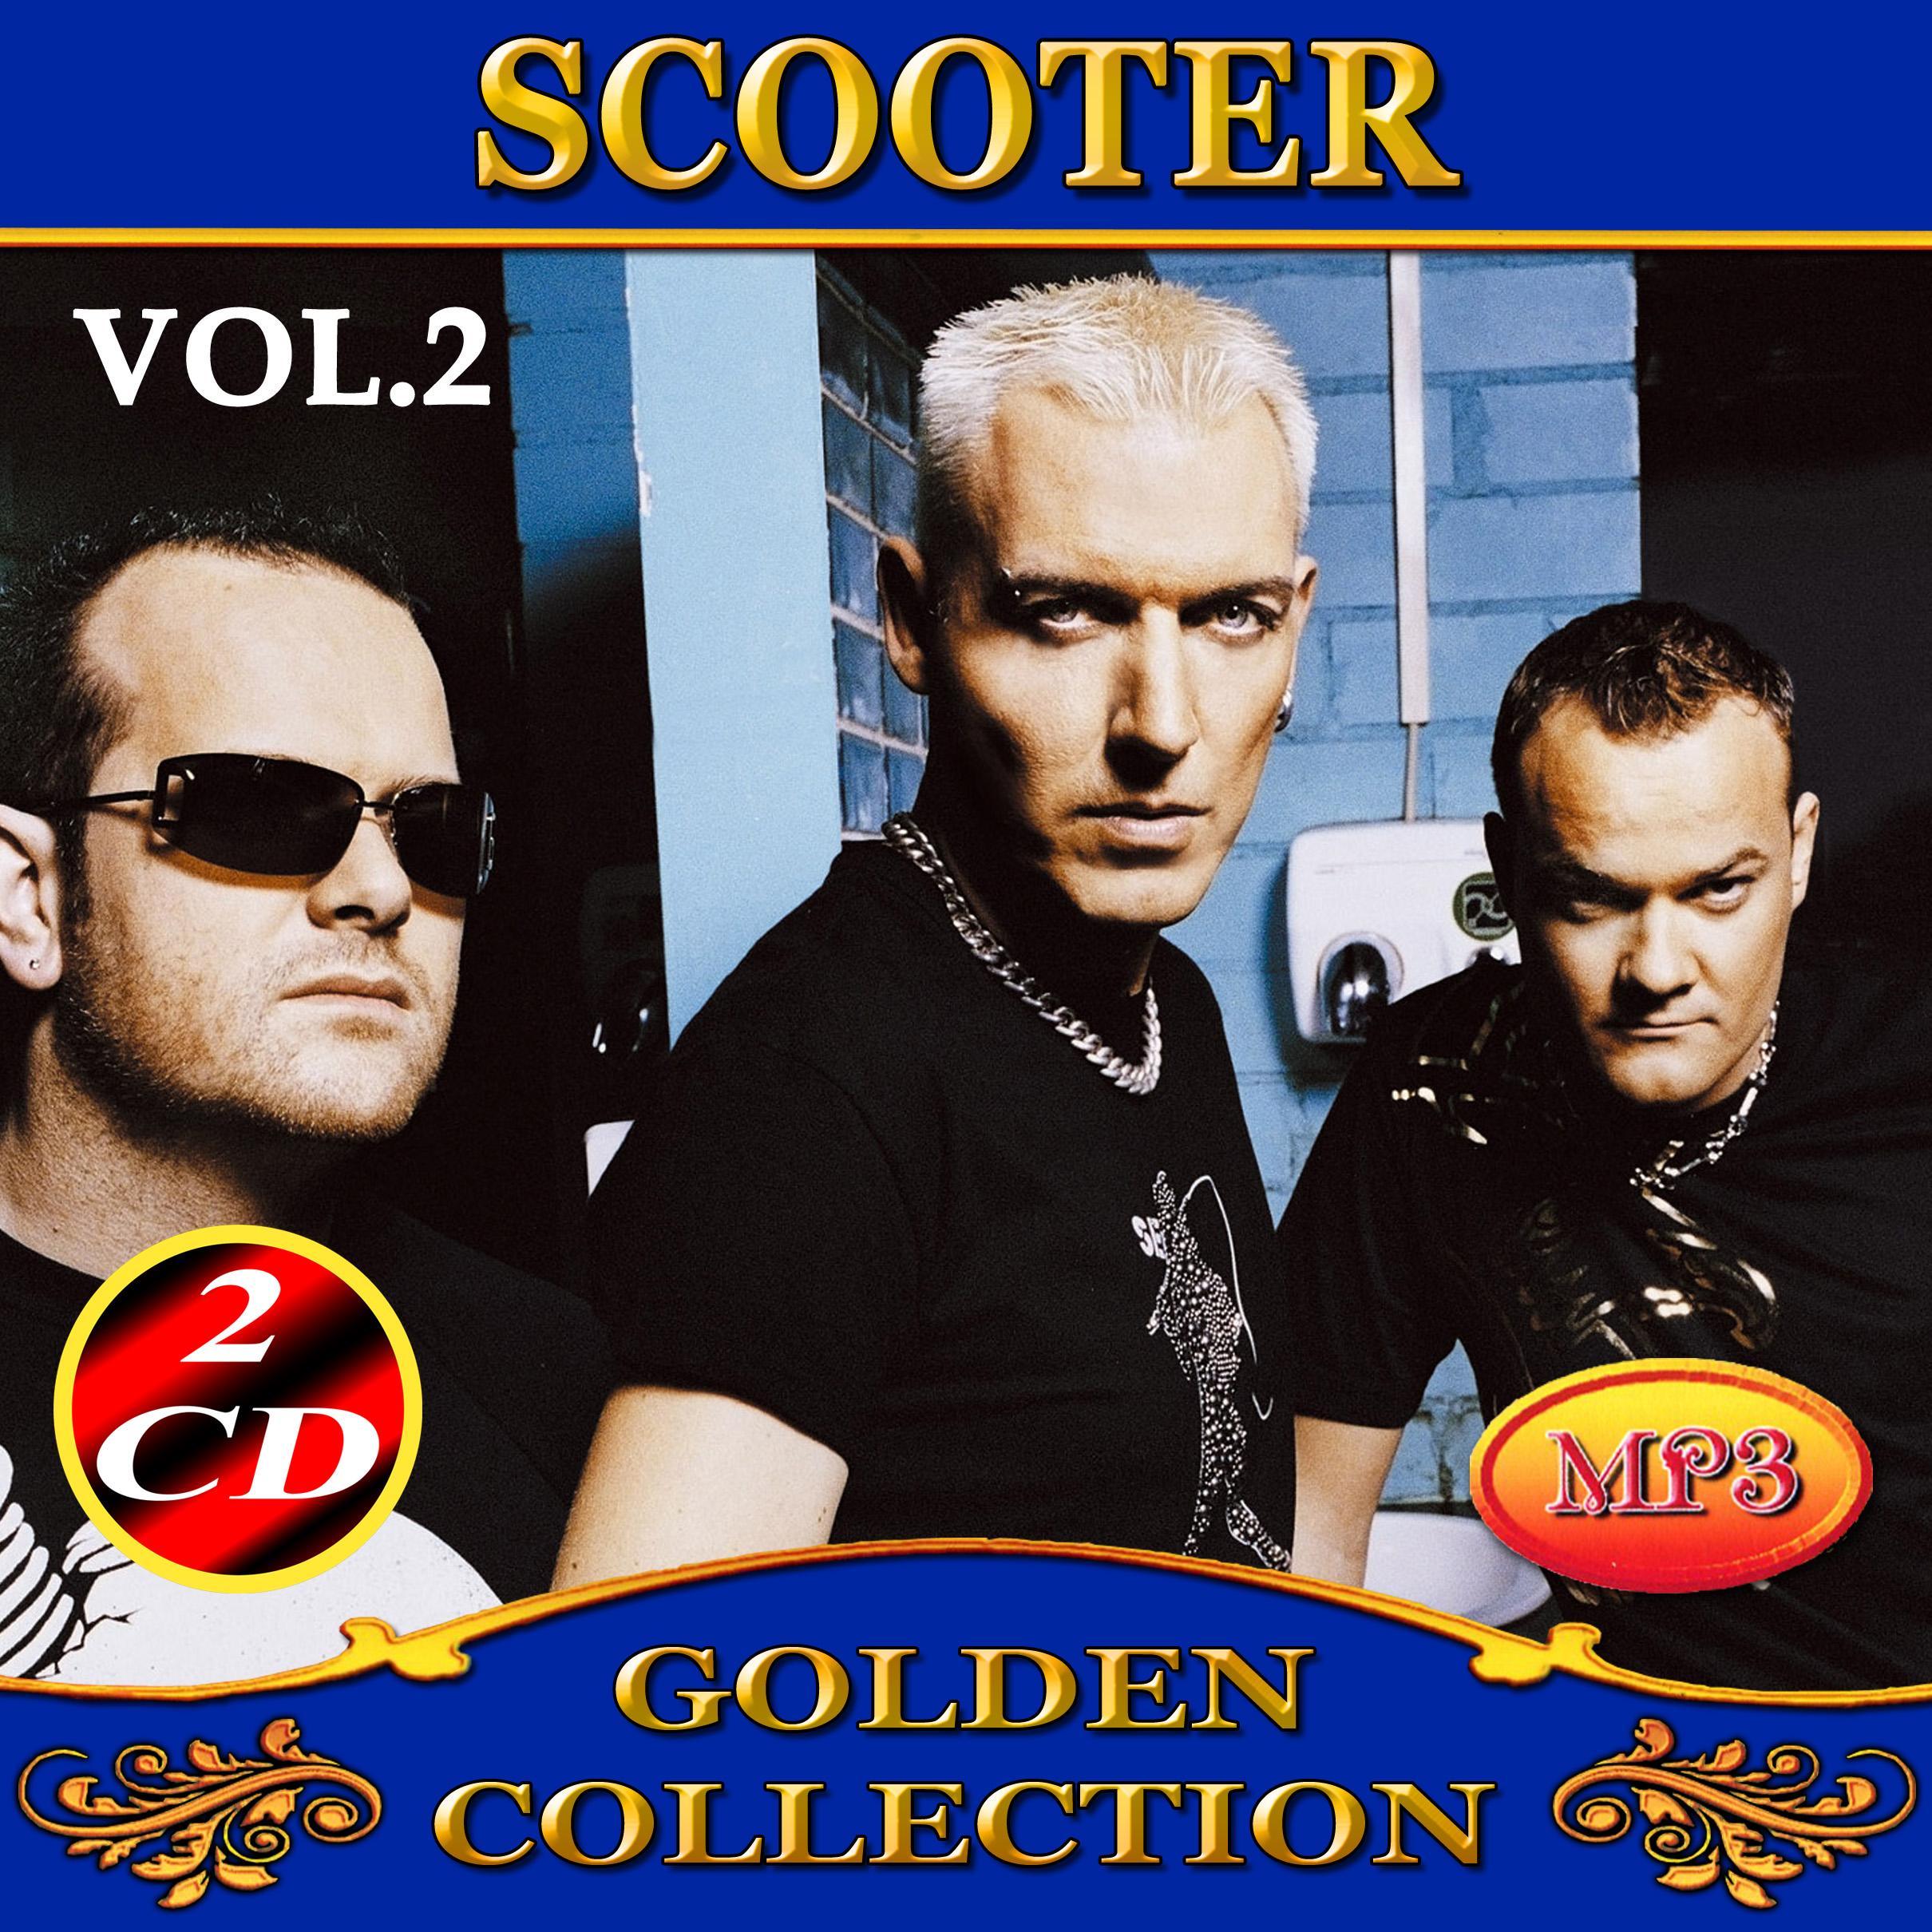 Scooter 2ч2cd [mp3]